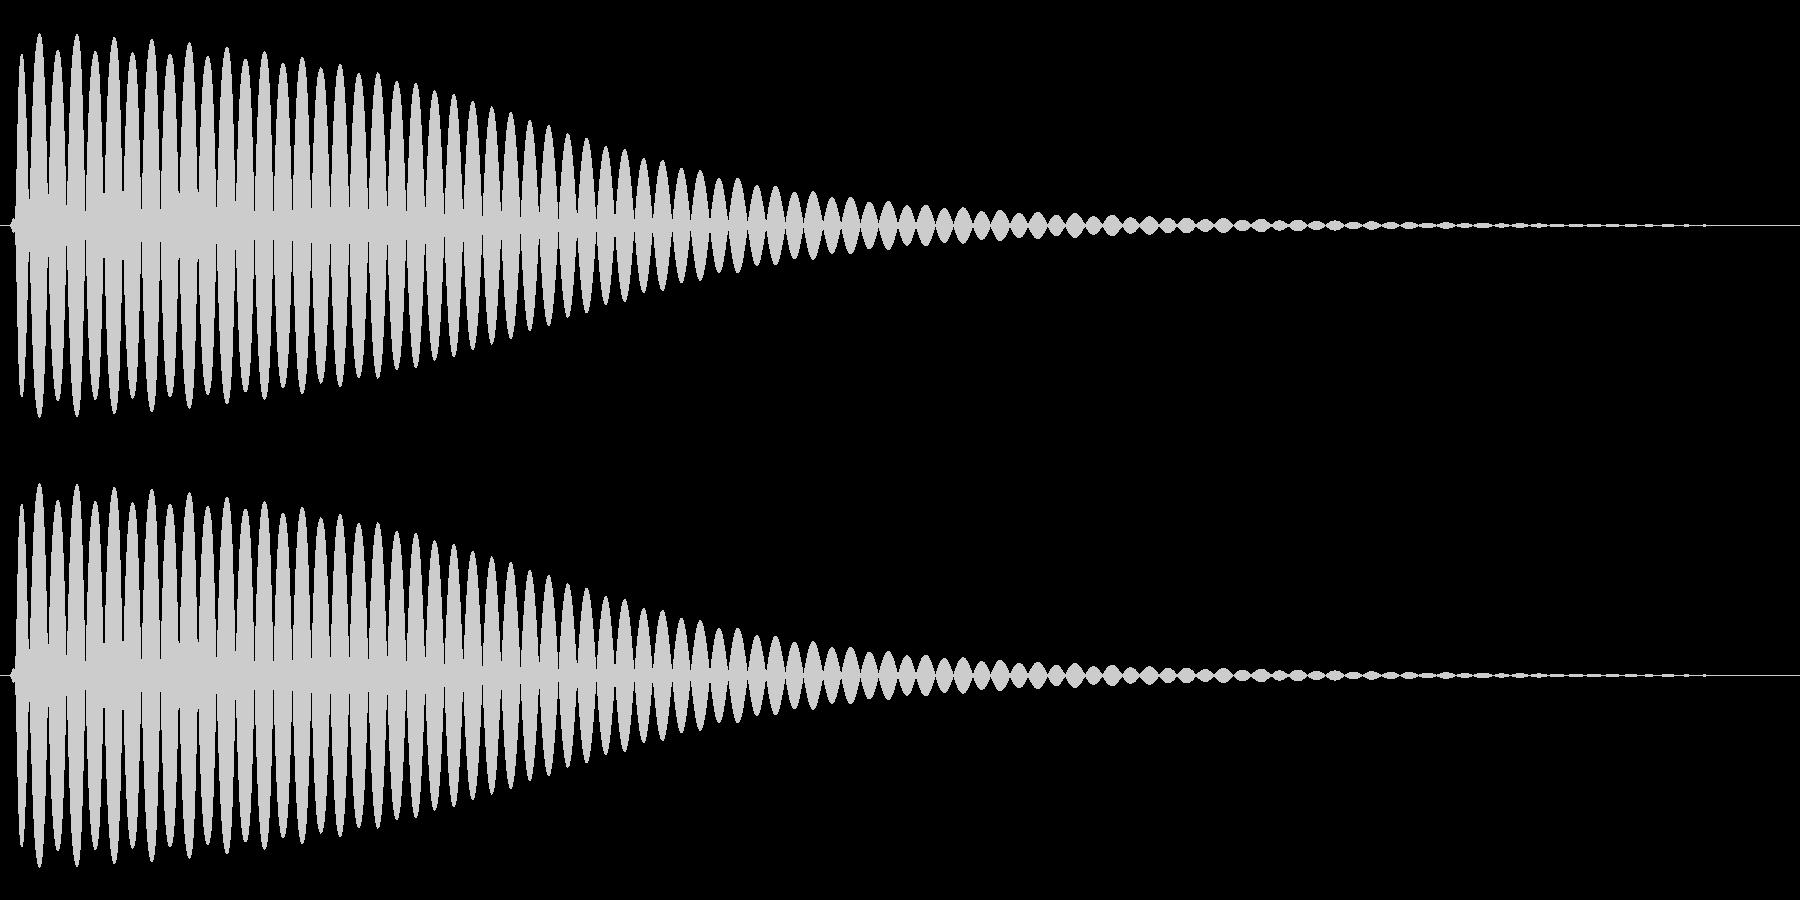 Com ファミコンなどのコマンド音 1の未再生の波形